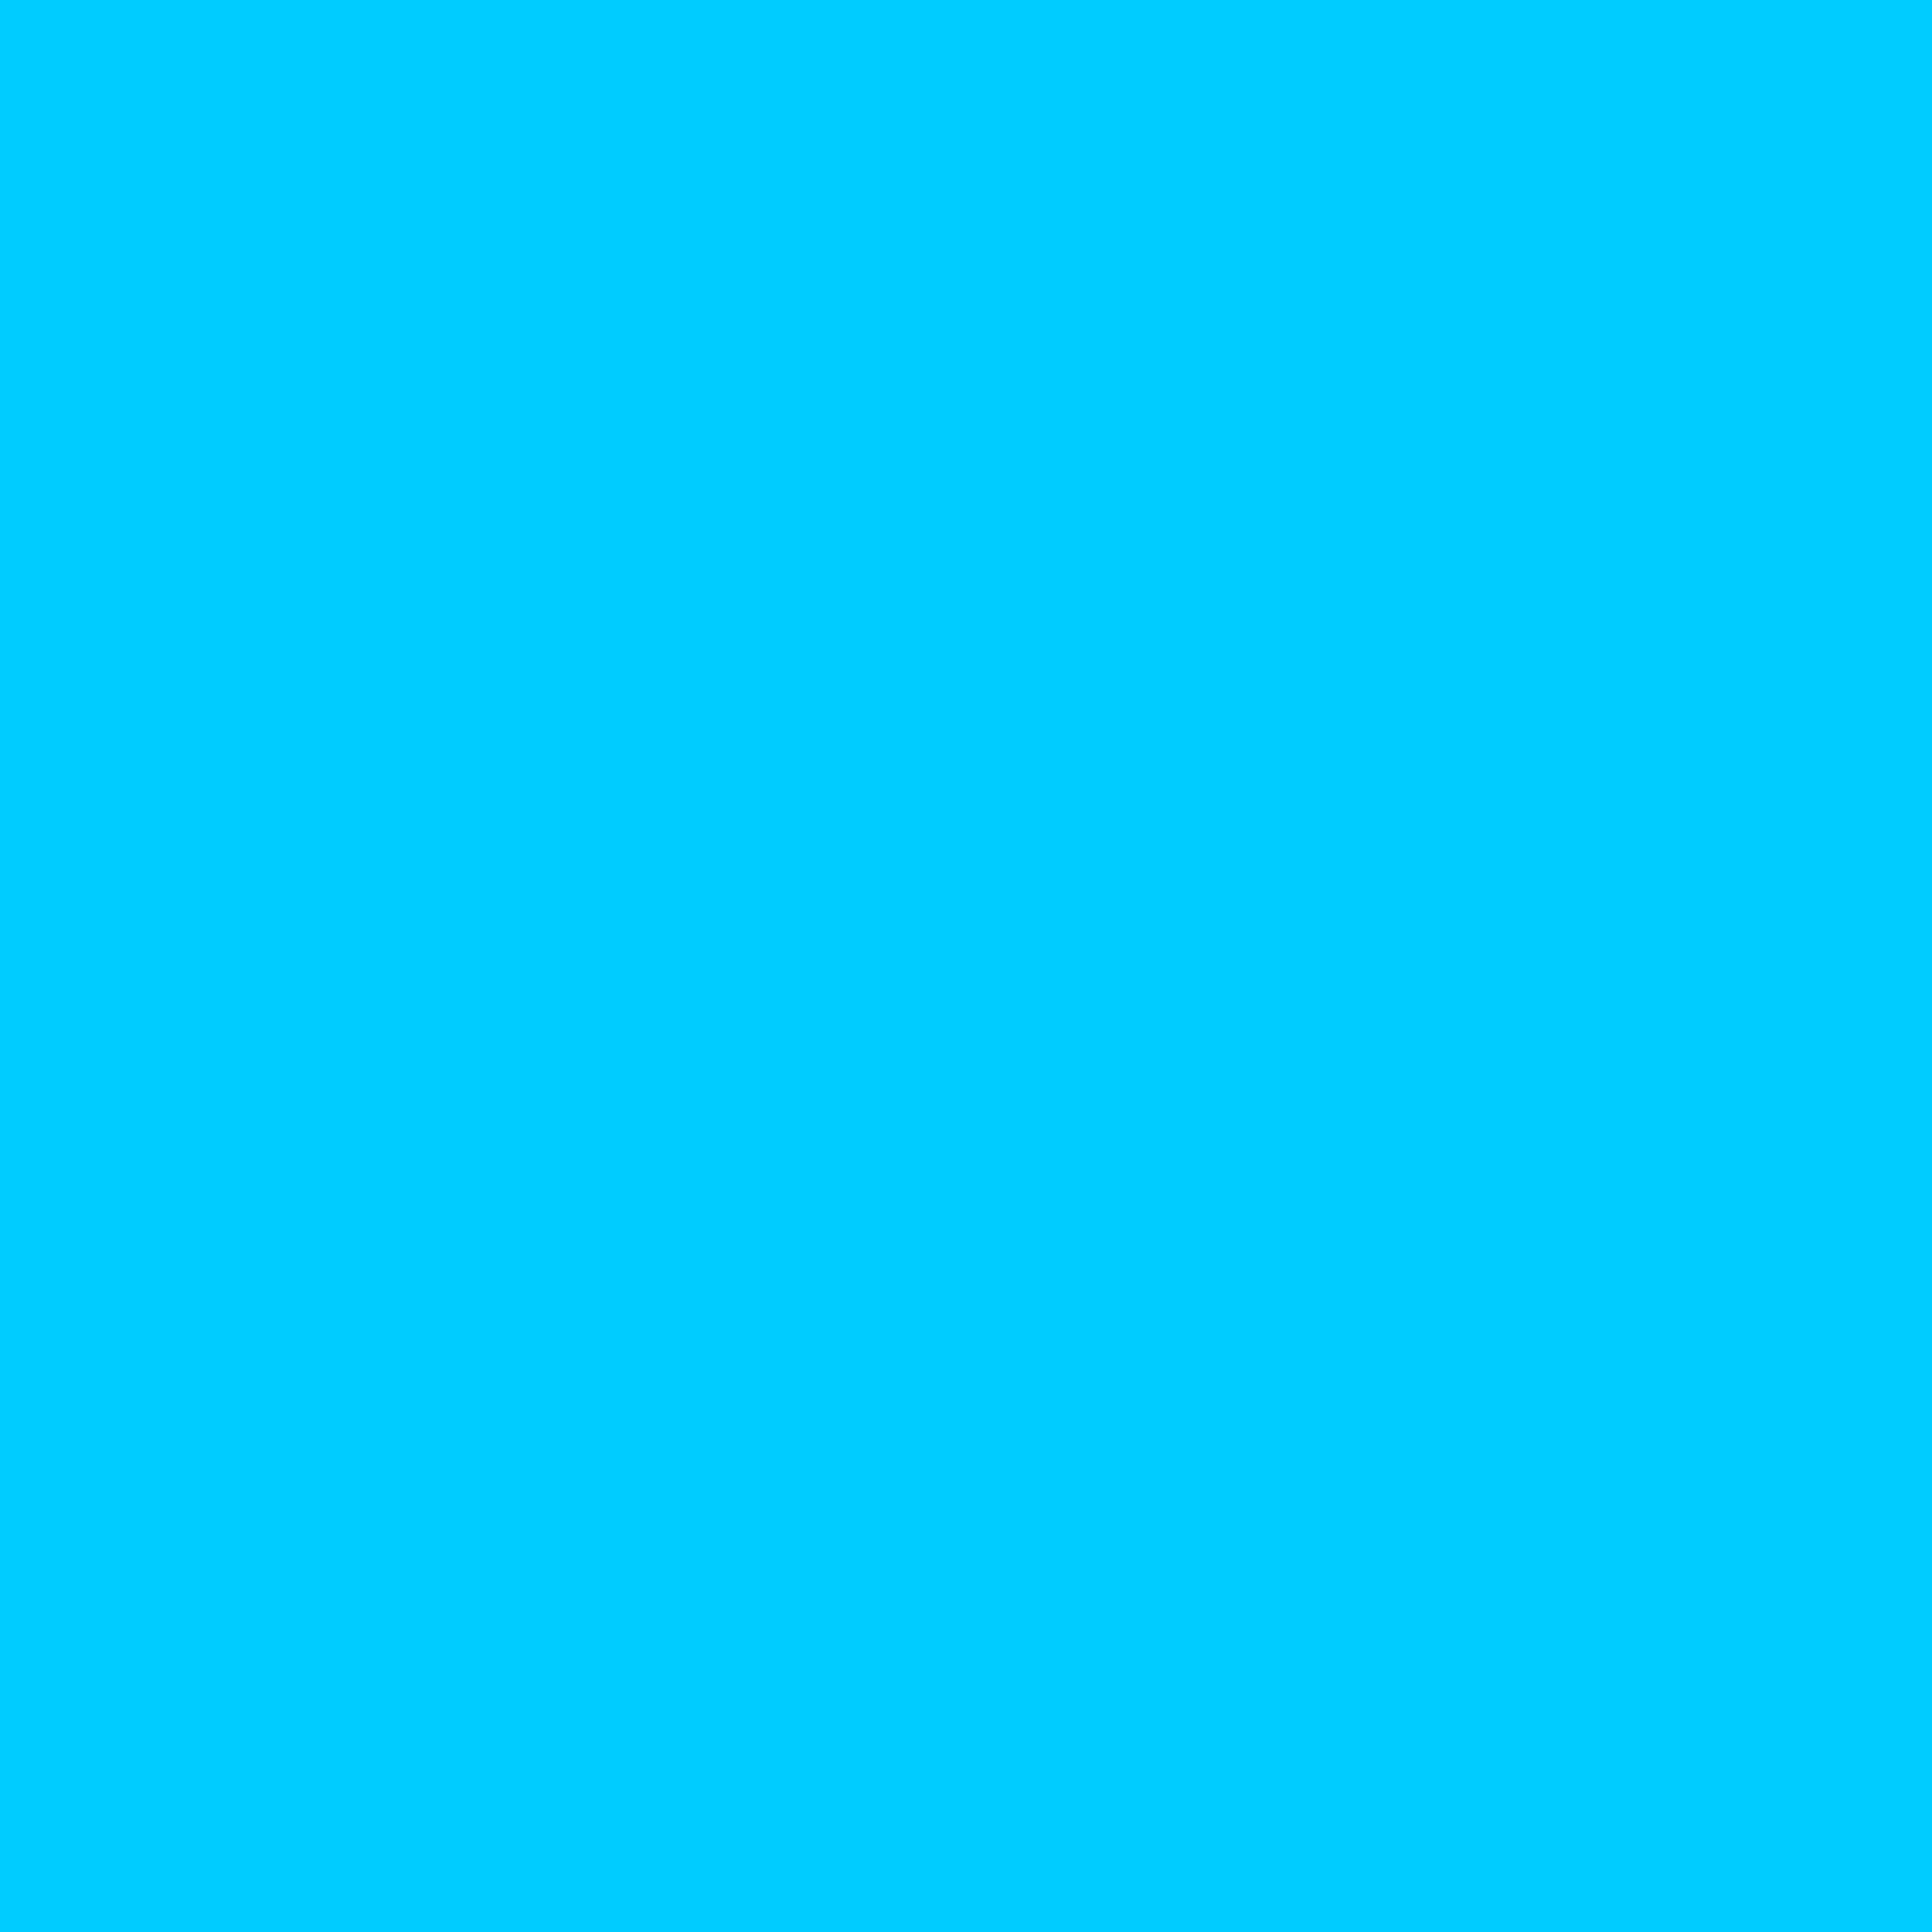 2732x2732 Vivid Sky Blue Solid Color Background